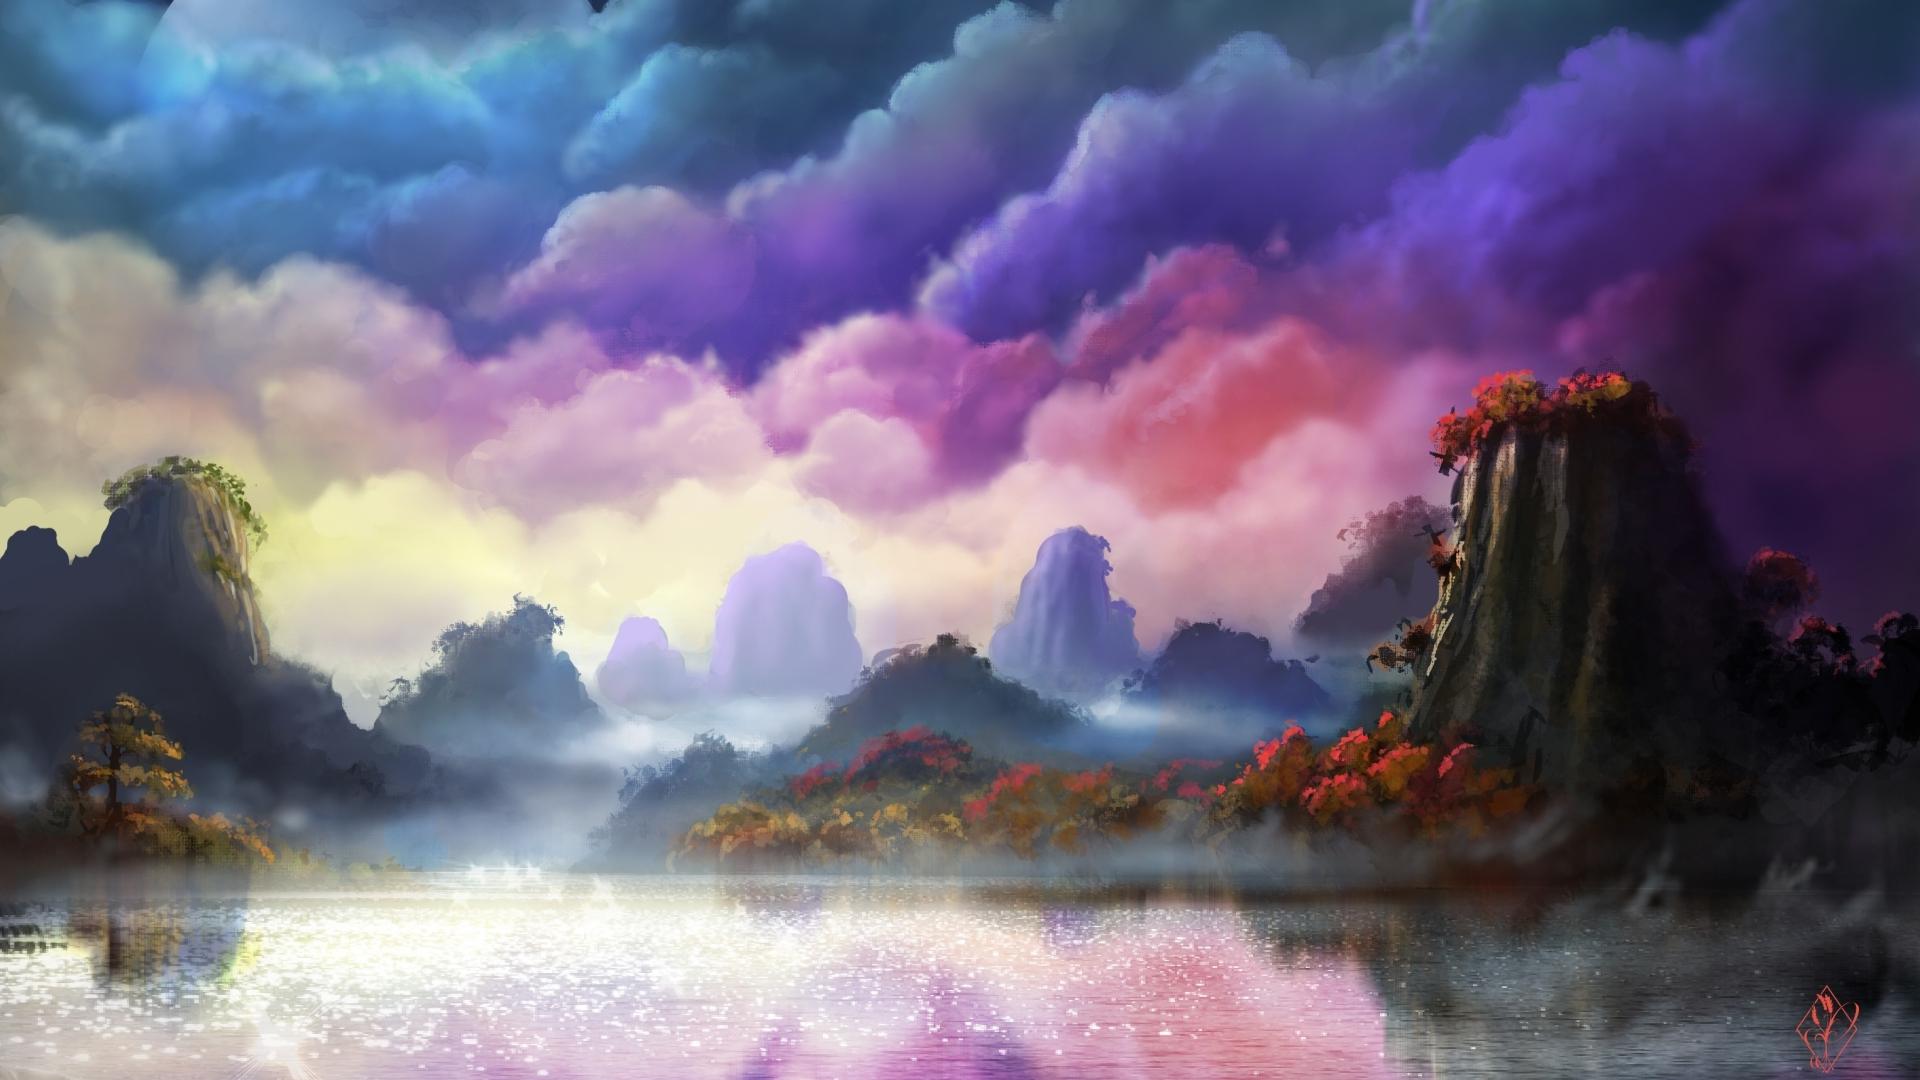 1920x1080 Fantasy Forest 1080p Laptop Full Hd Wallpaper Hd